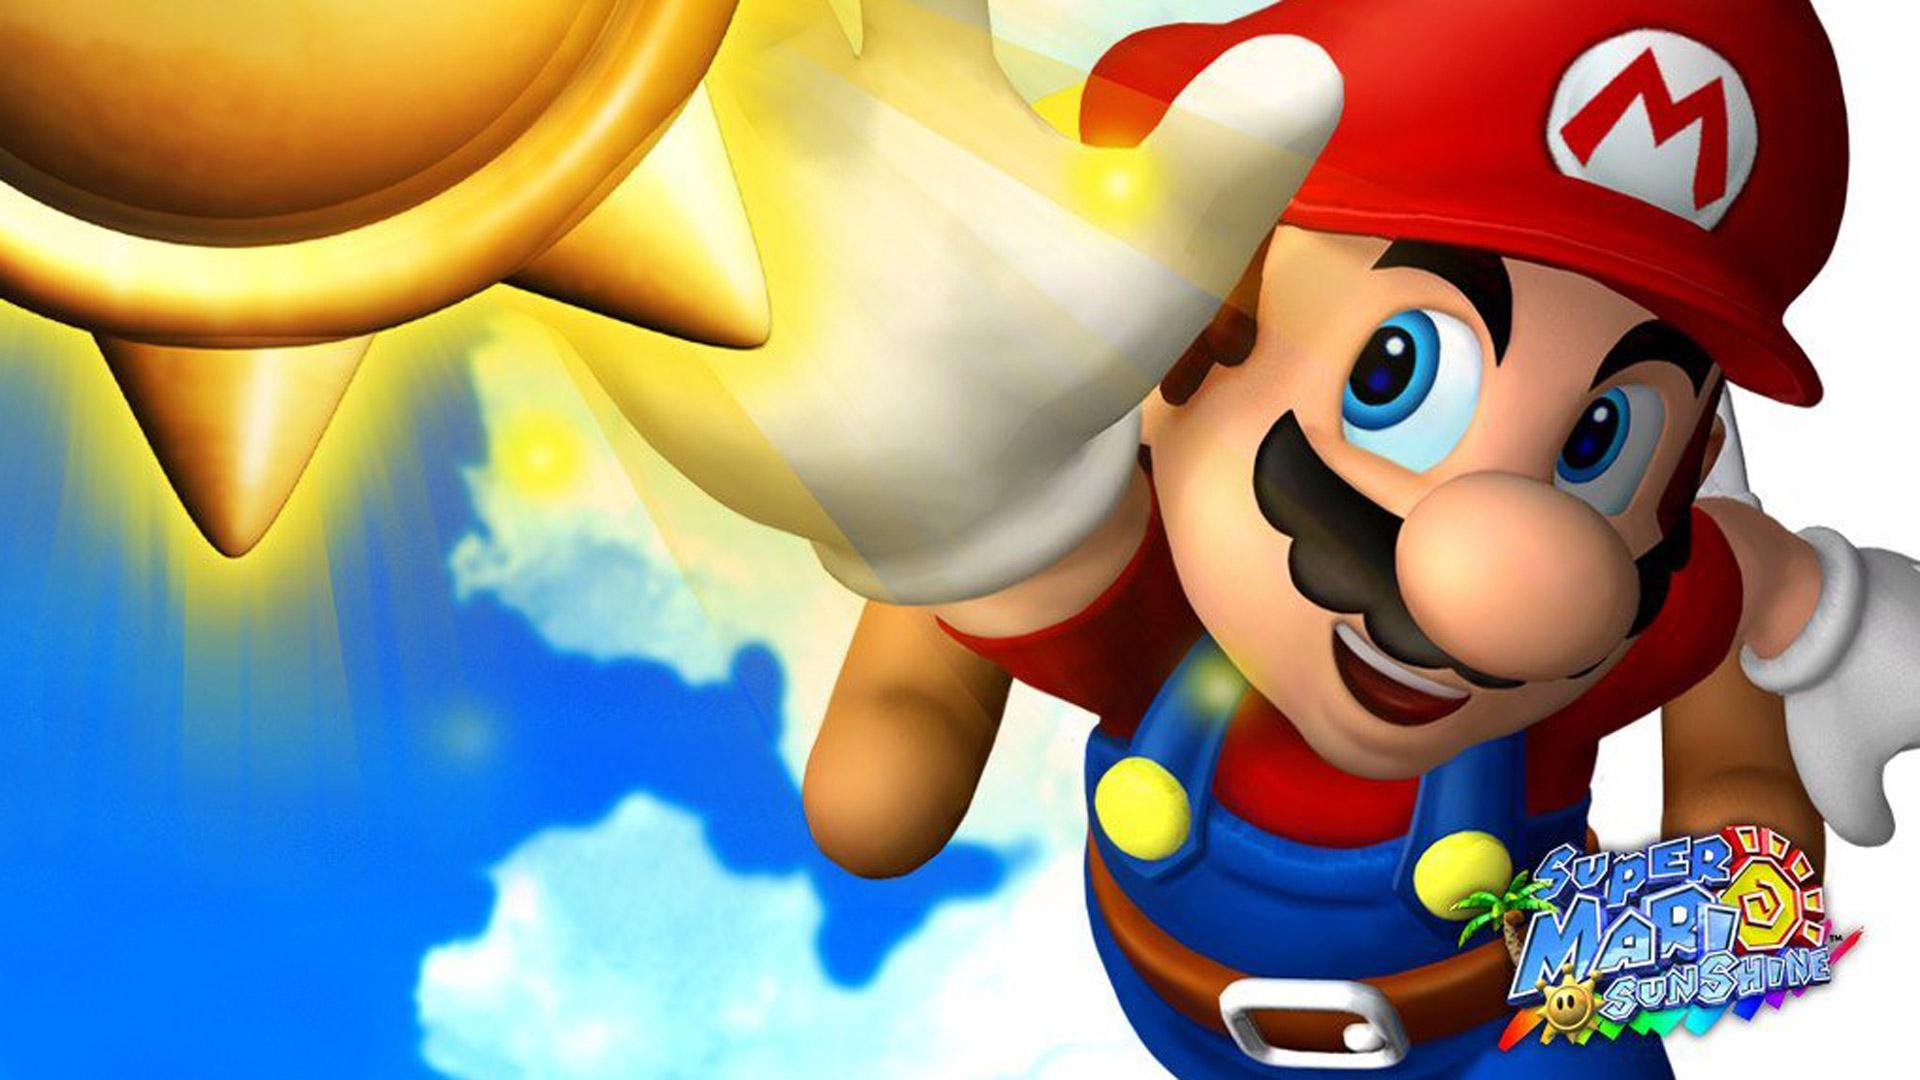 Happy 15th birthday Super Mario Sunshine! You're still the second best 3D Mario screenshot